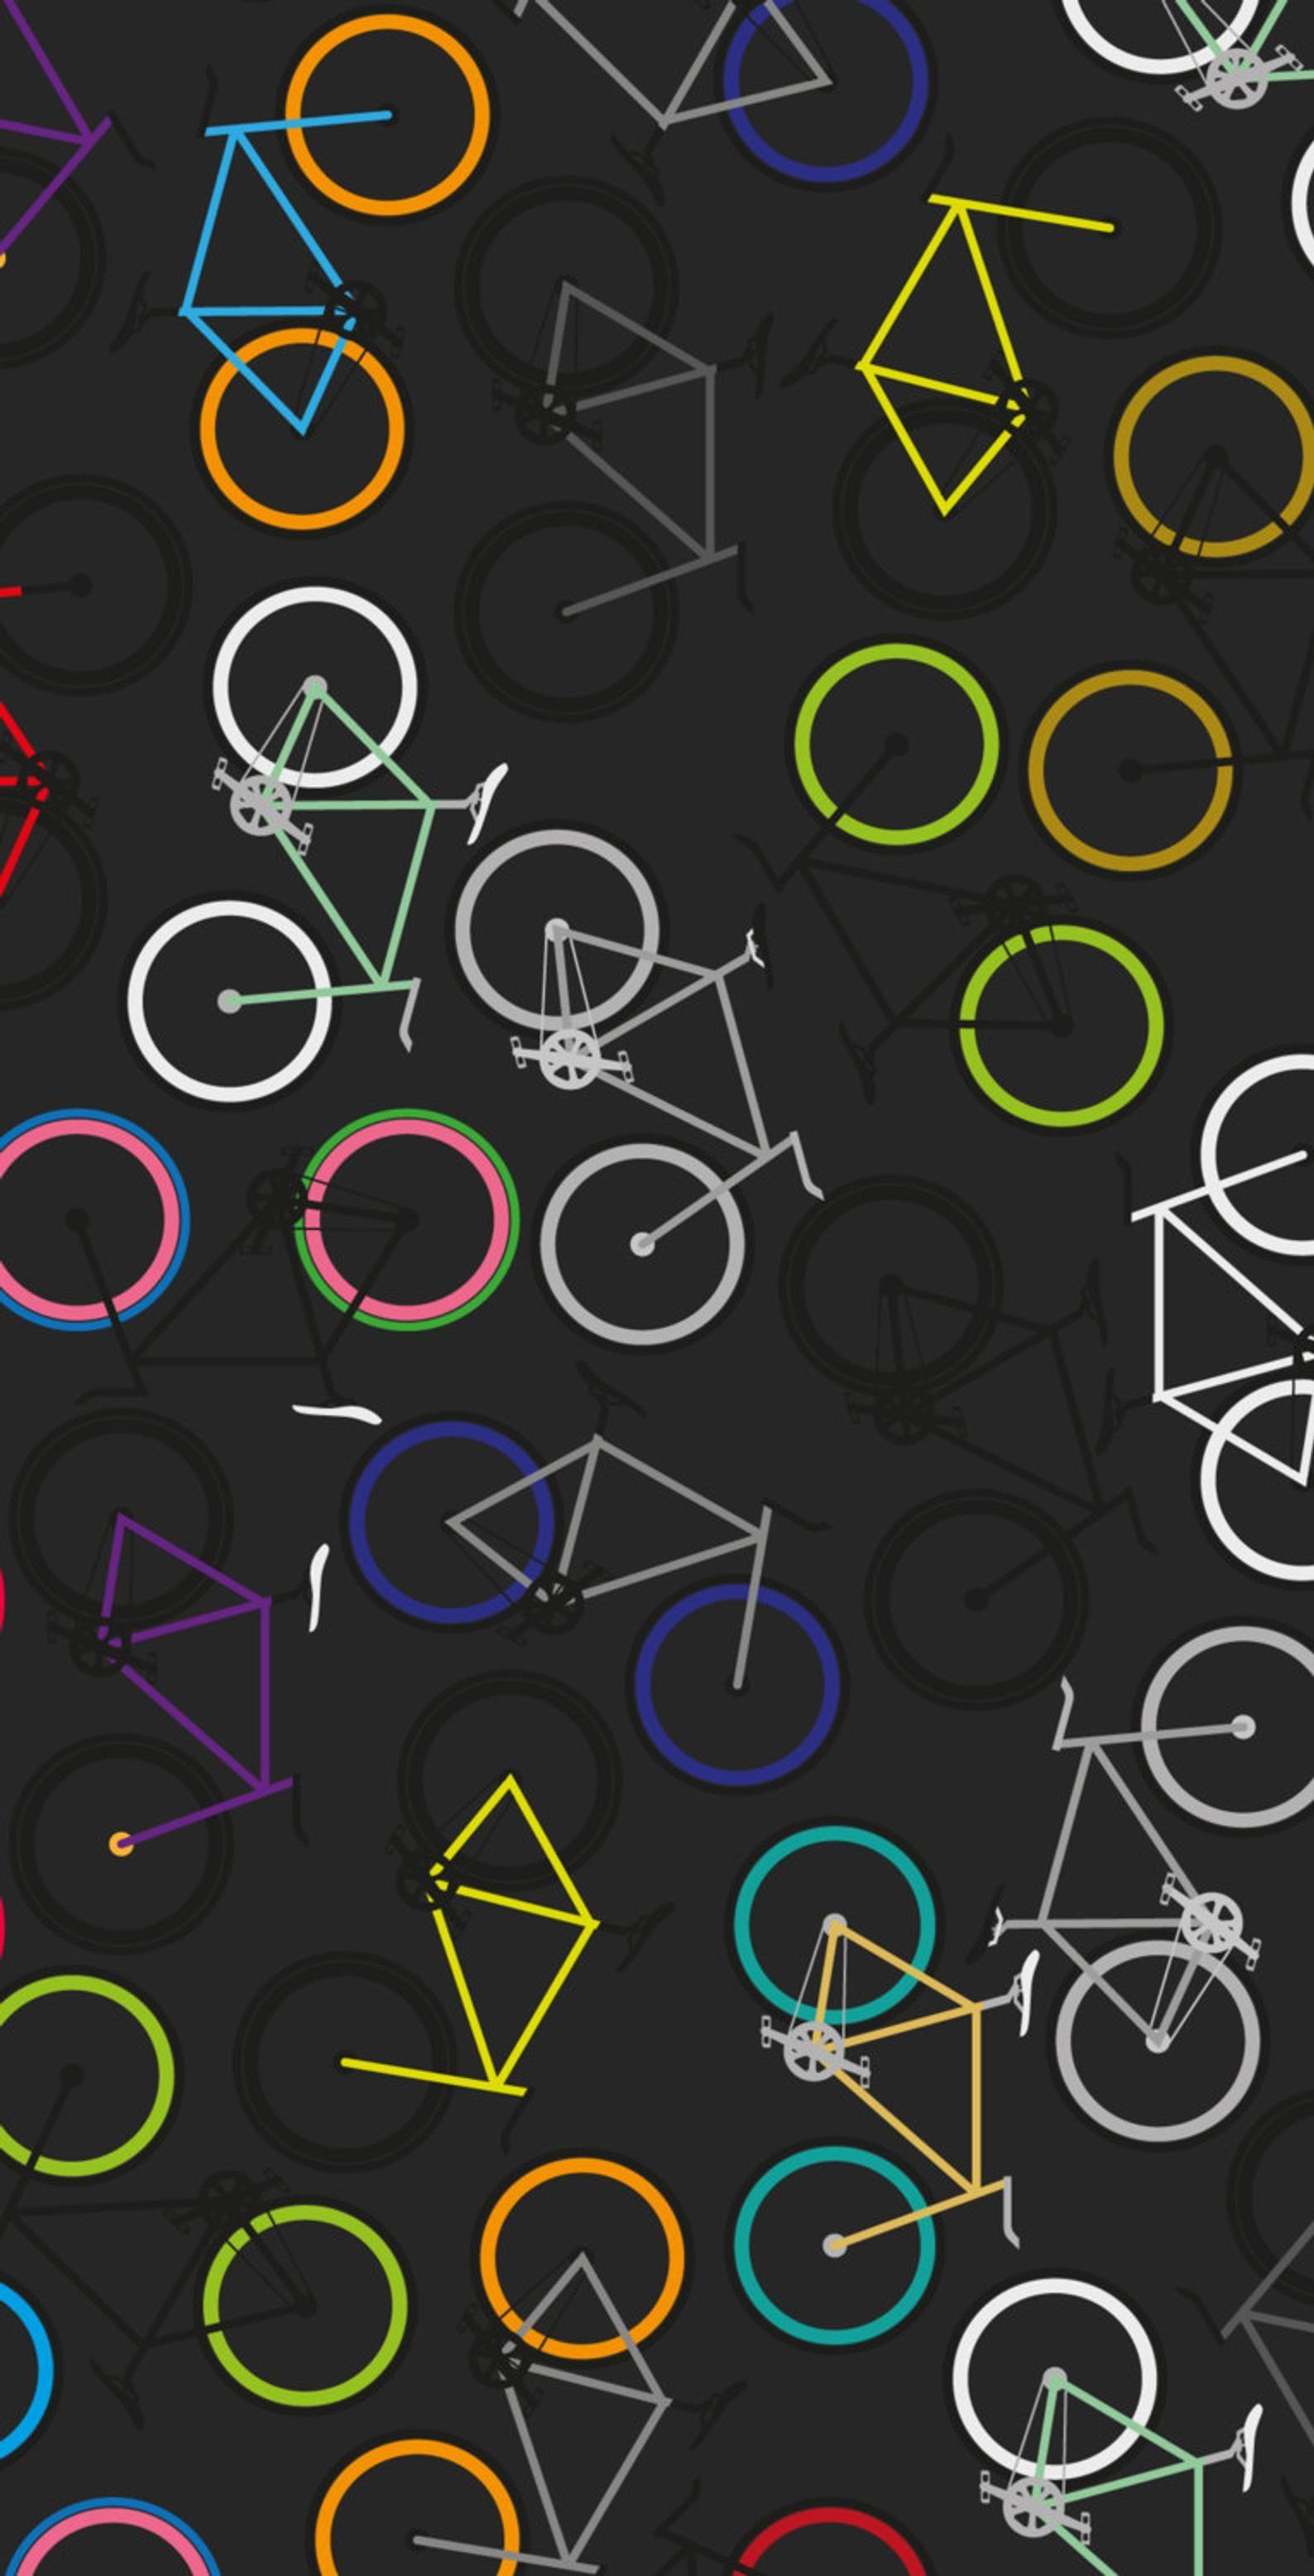 Bicycle Themed Cornhole Board Prints / Wraps | Corn Hole Wraps | Bag Toss | Corn Toss | Custom